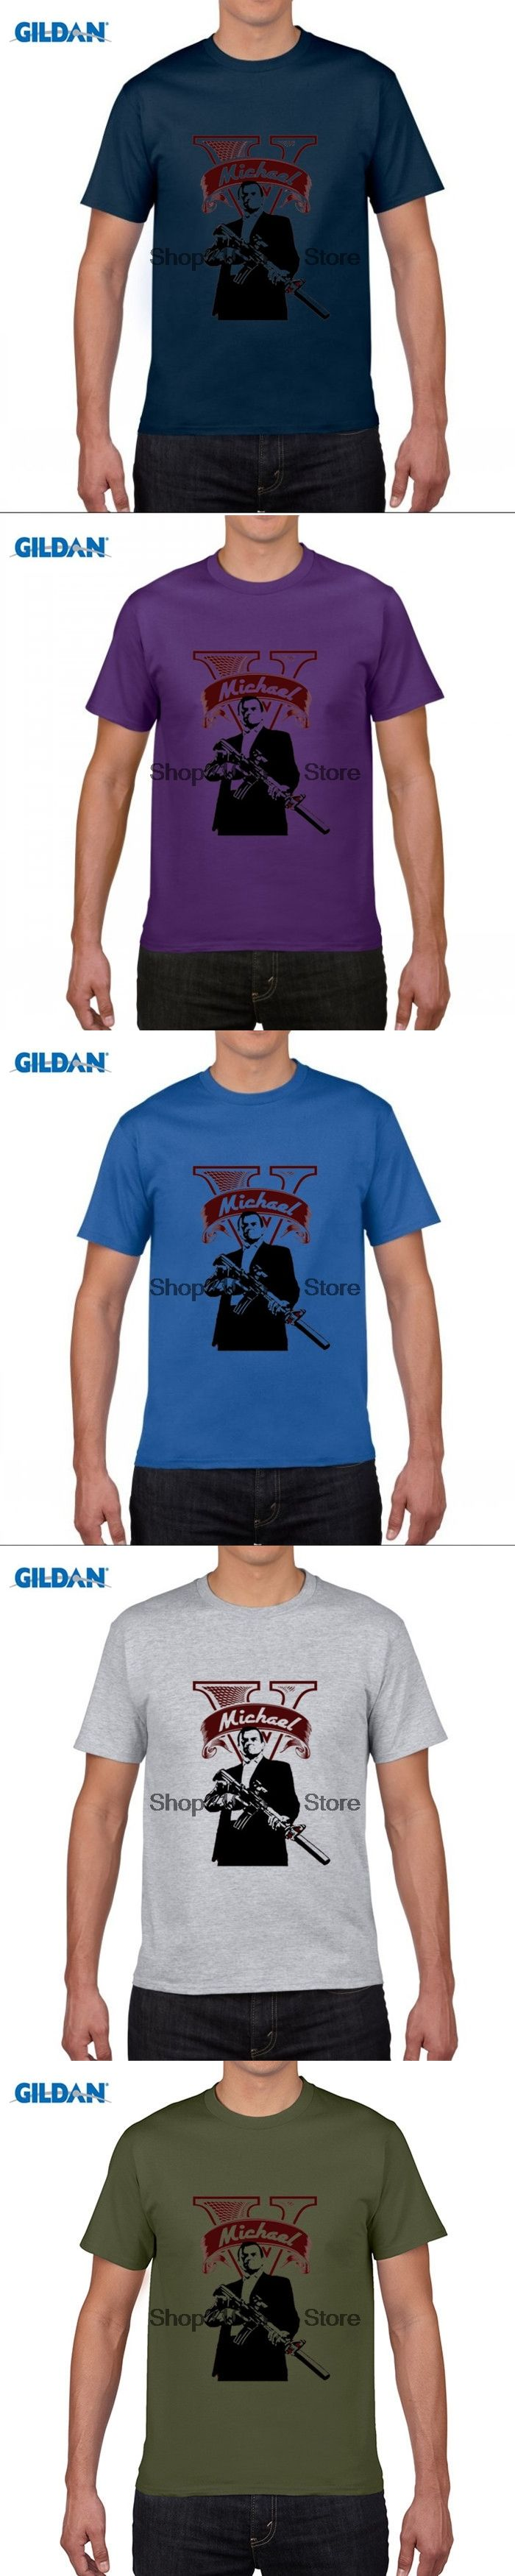 GILDAN Grand Theft Auto V Characters T Shirt Men  GTA 5 Render Franklin/Trevor Render/Micheal Printed T-Shirt